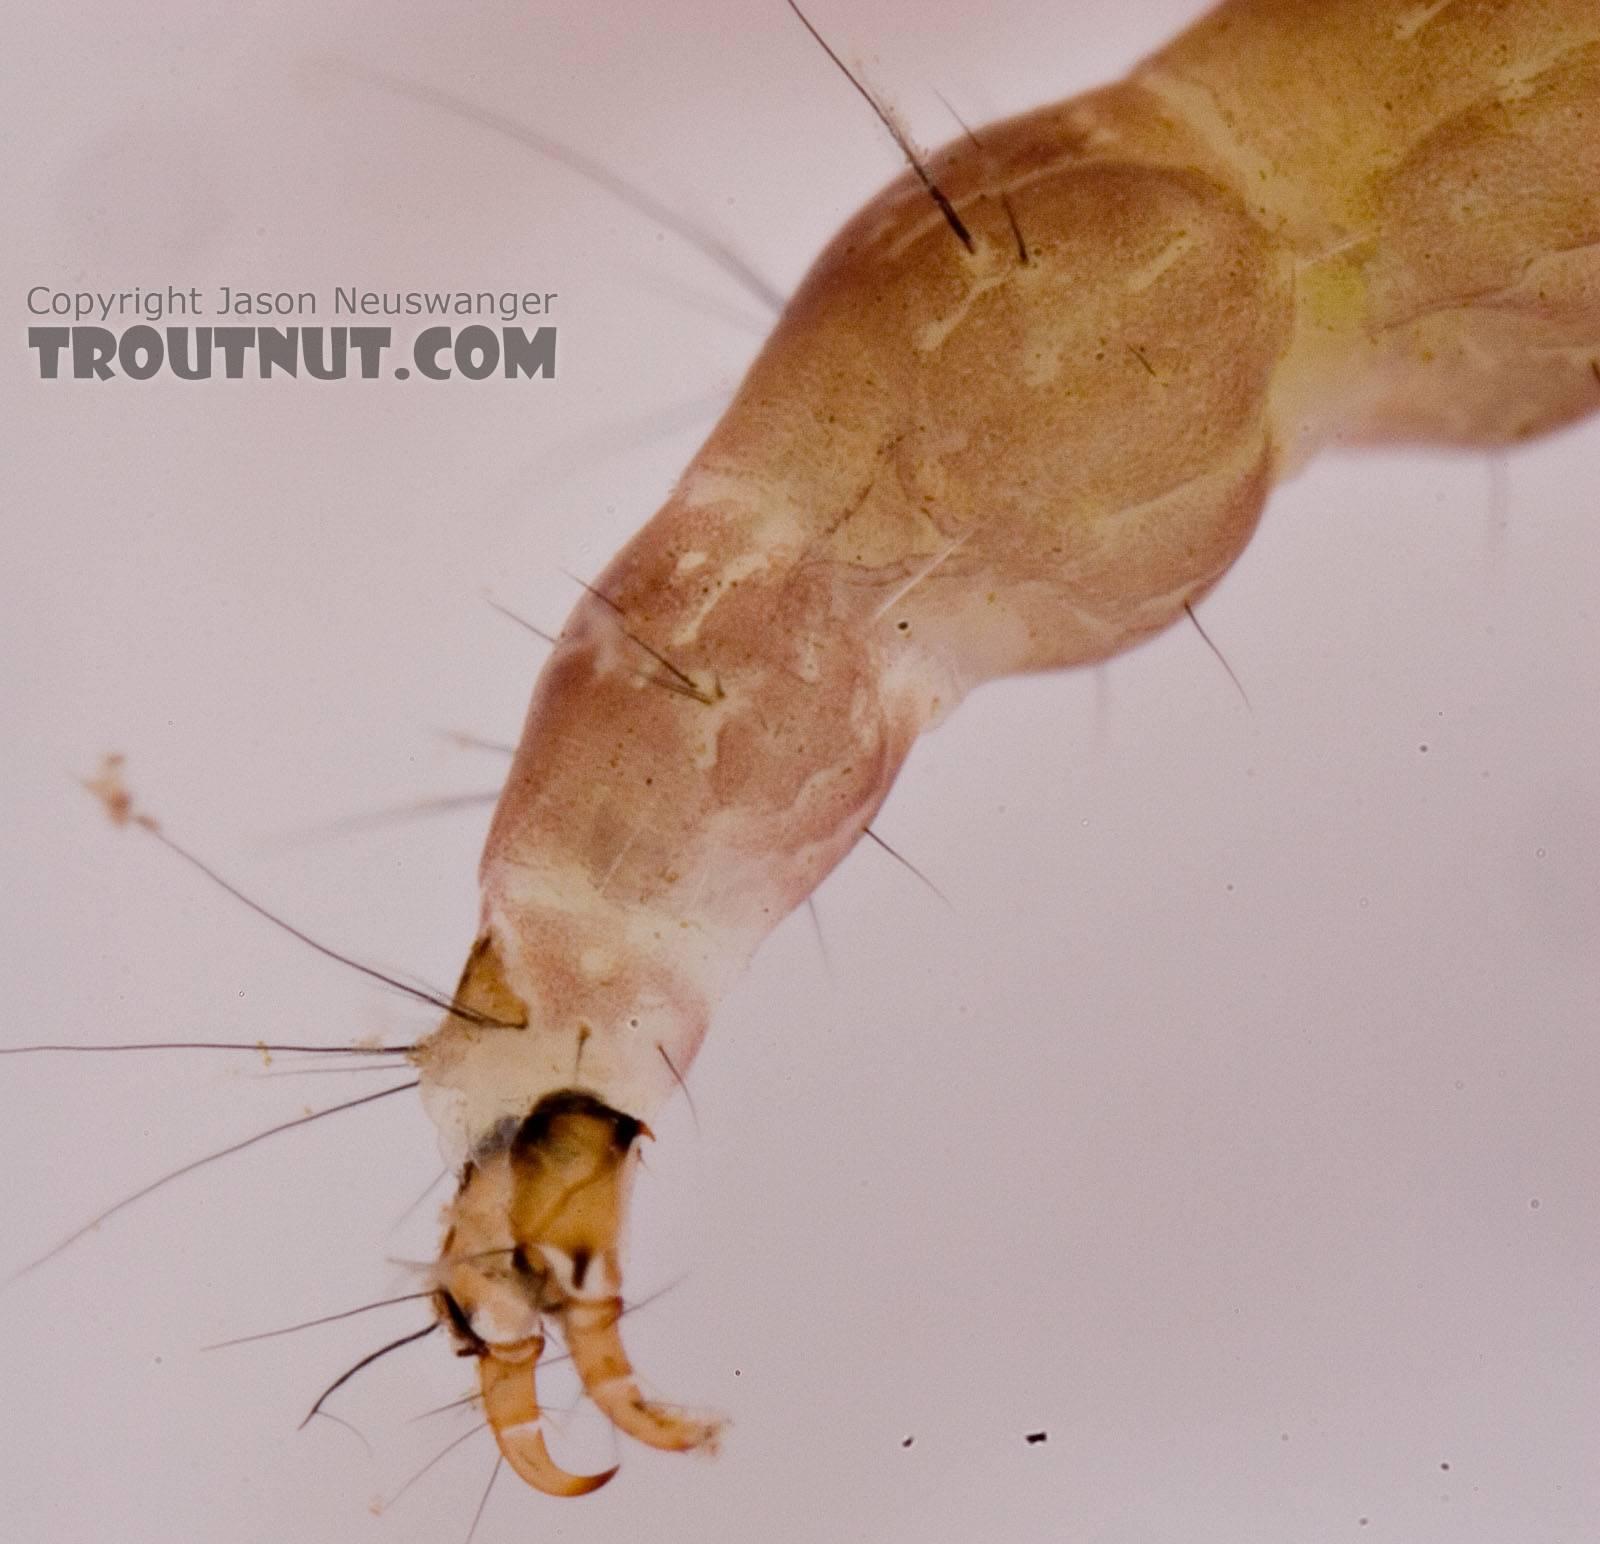 Rhyacophila carolina (Green Sedge) Caddisfly Larva from Mongaup Creek in New York